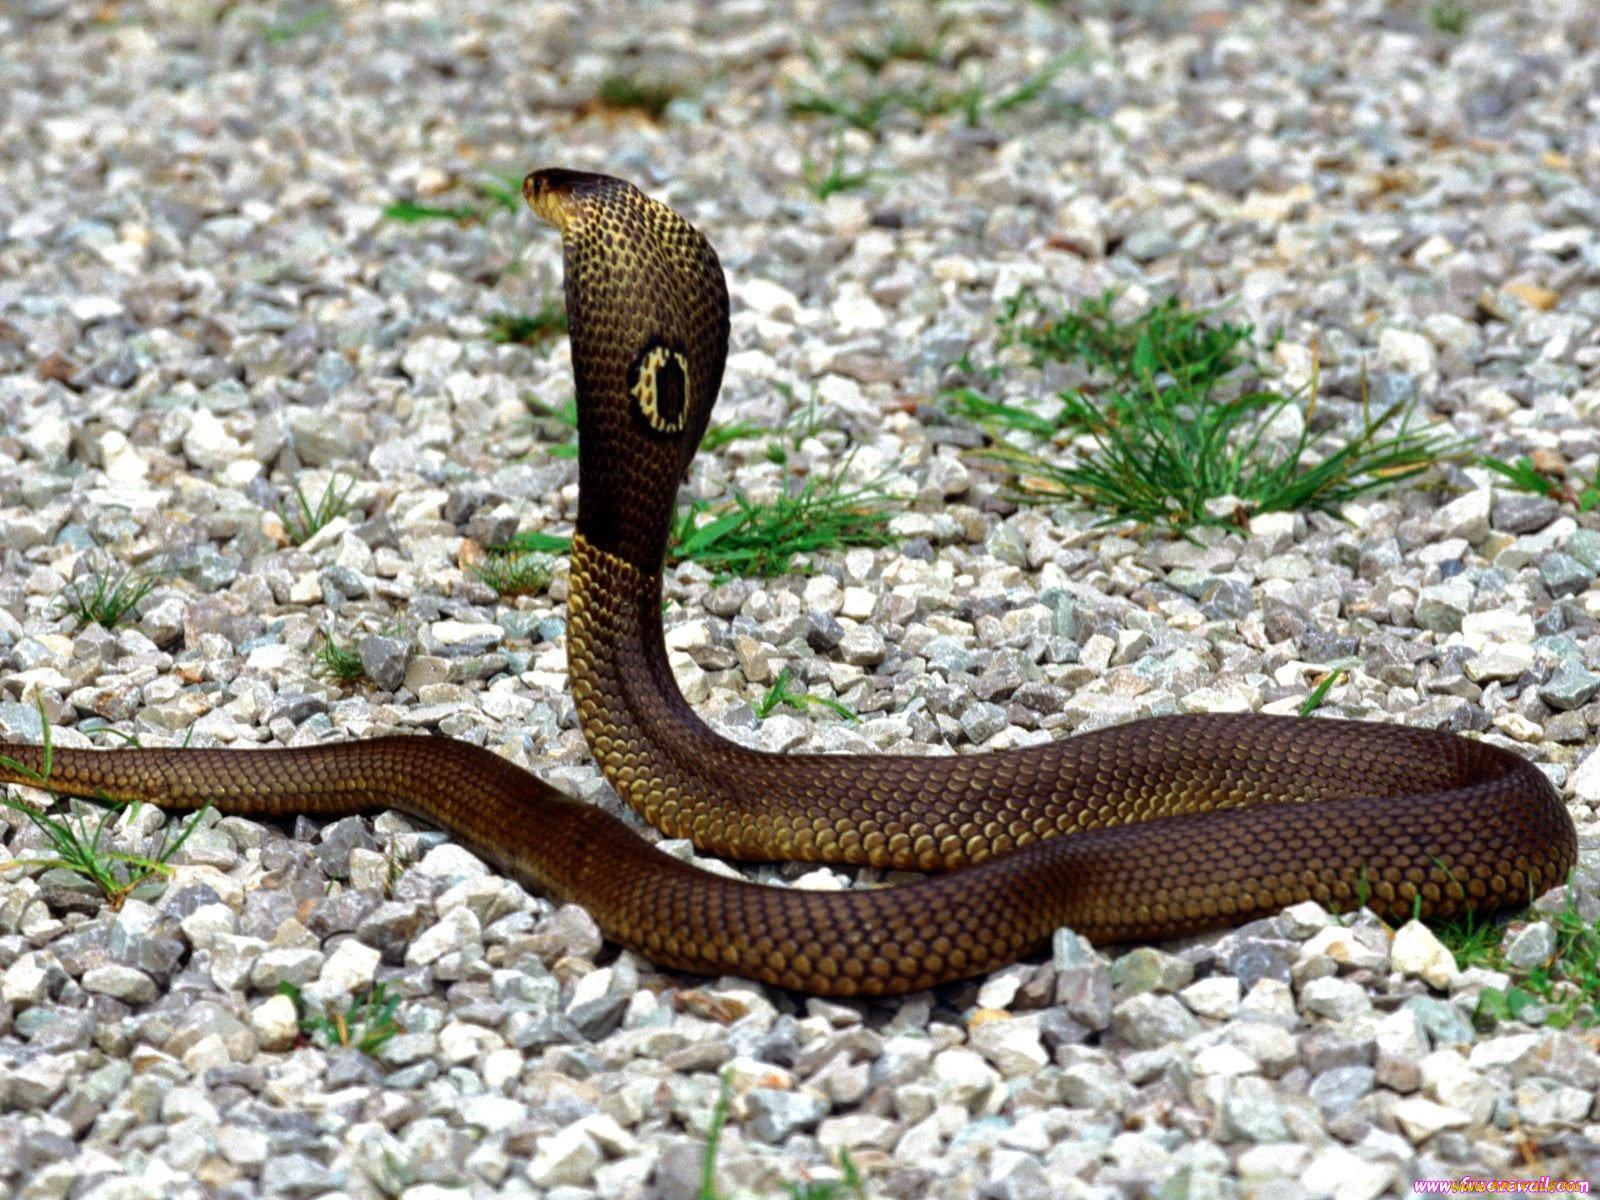 названия змей с фотографиями фото после лечения